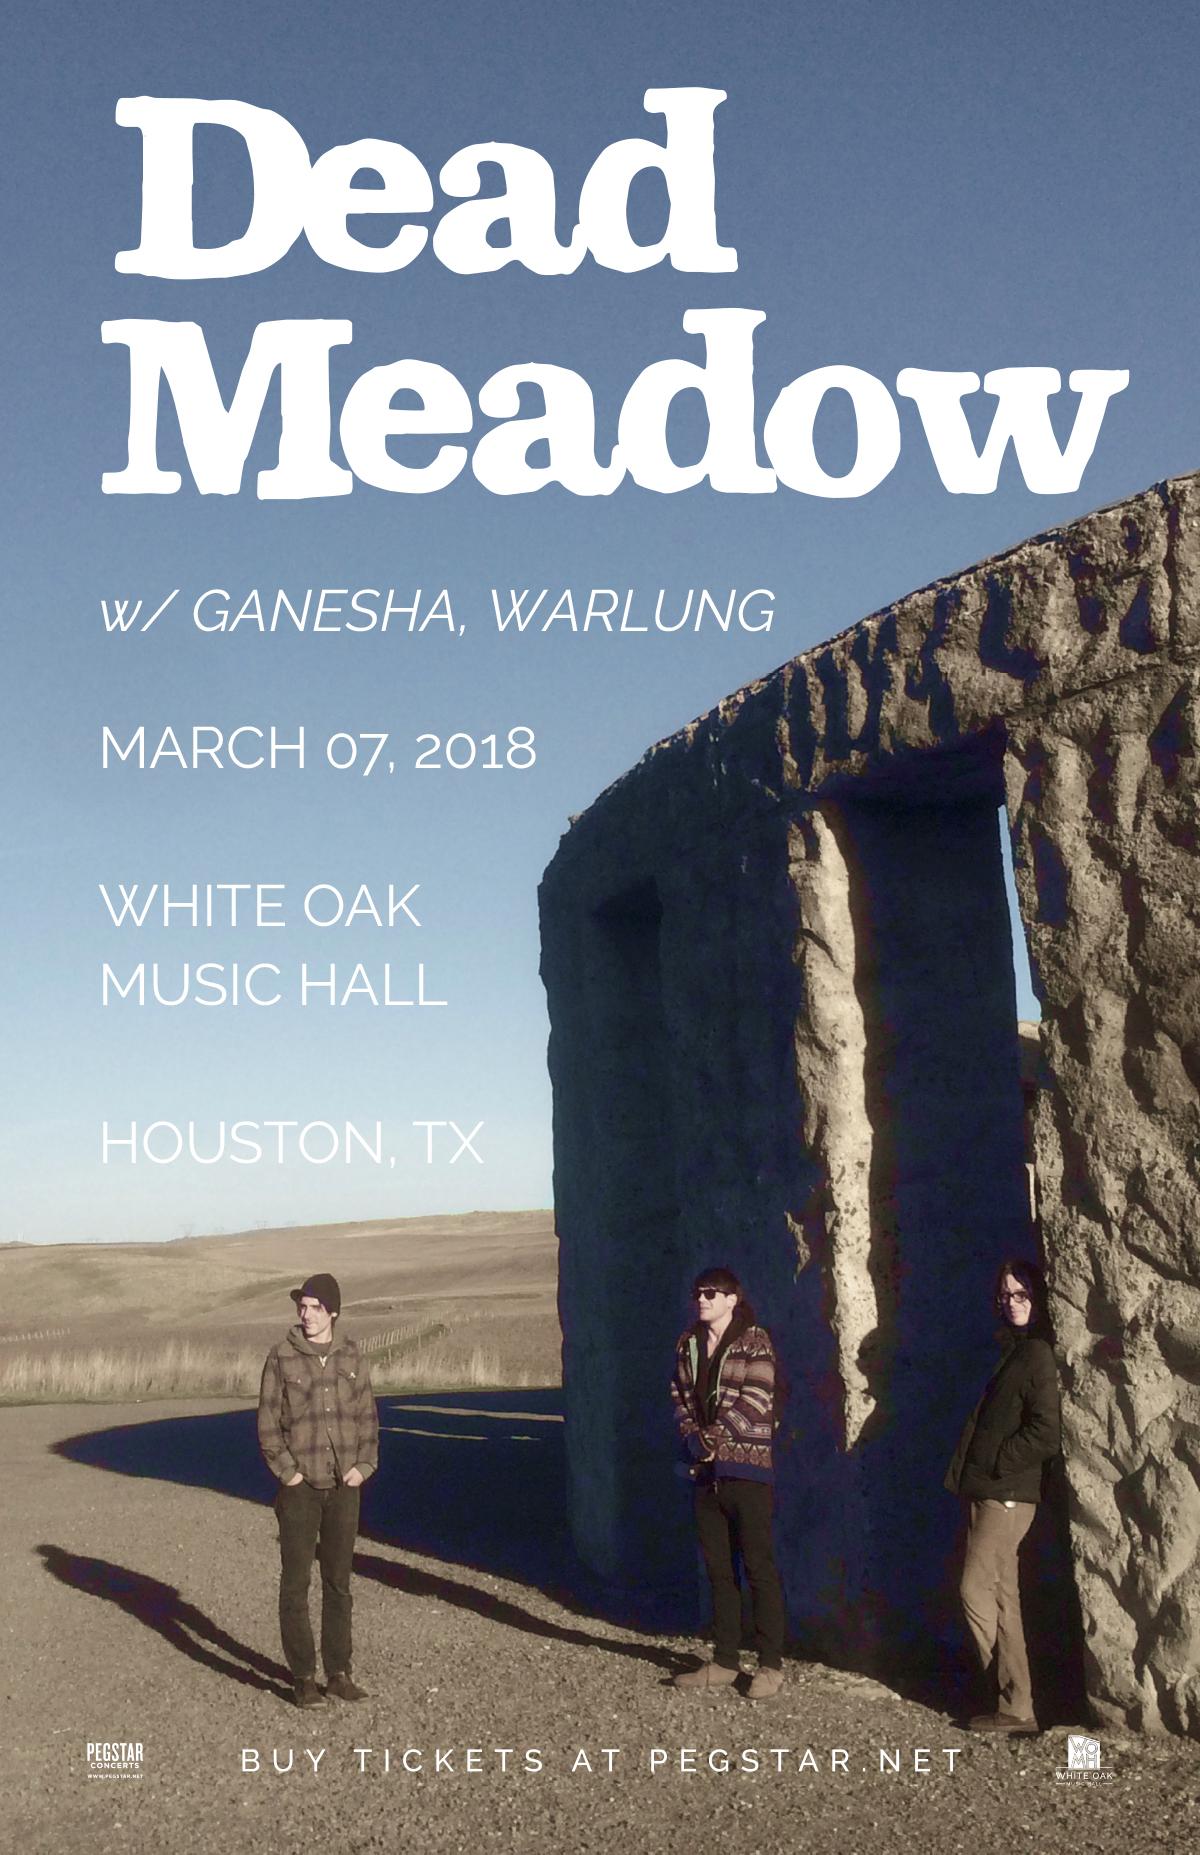 Dead Meadow, Ganesha, Warlung